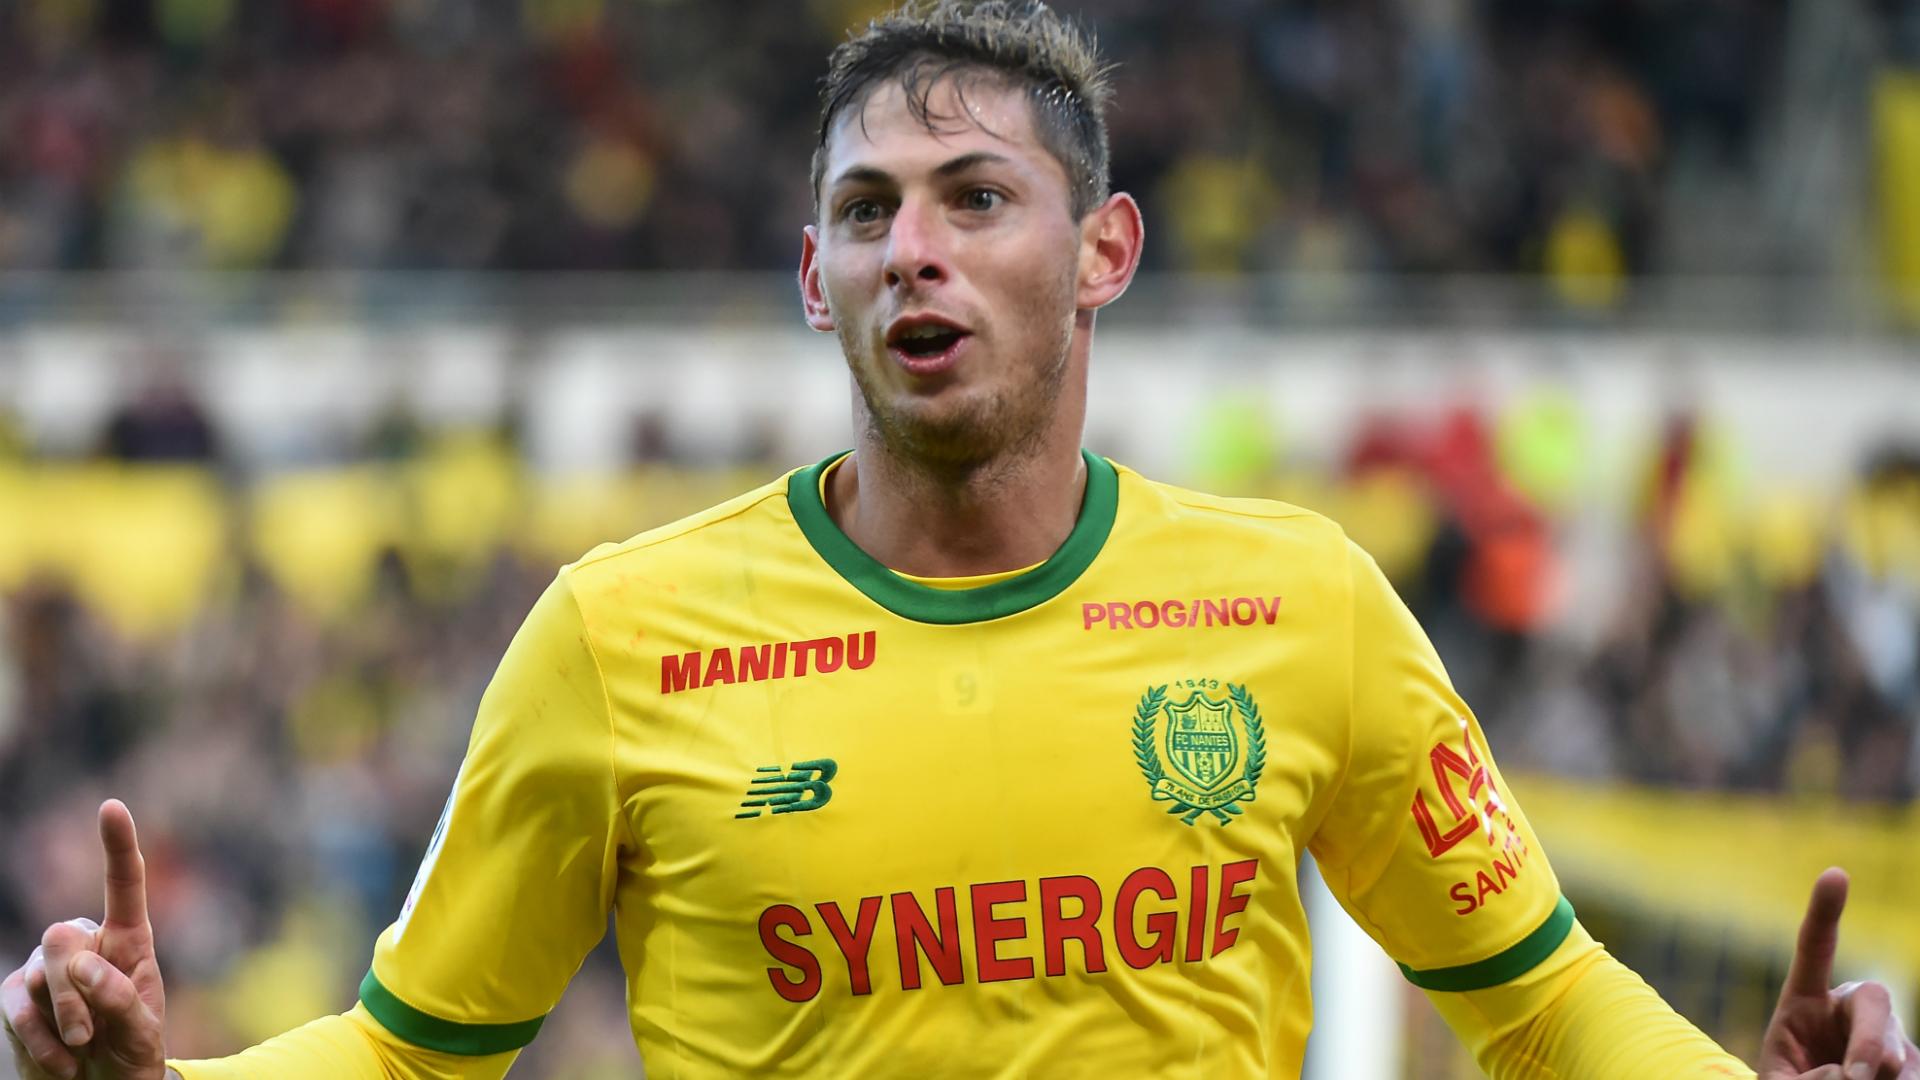 Cardiff City told to pay Nantes $6.5 million for Emiliano Sala transfer